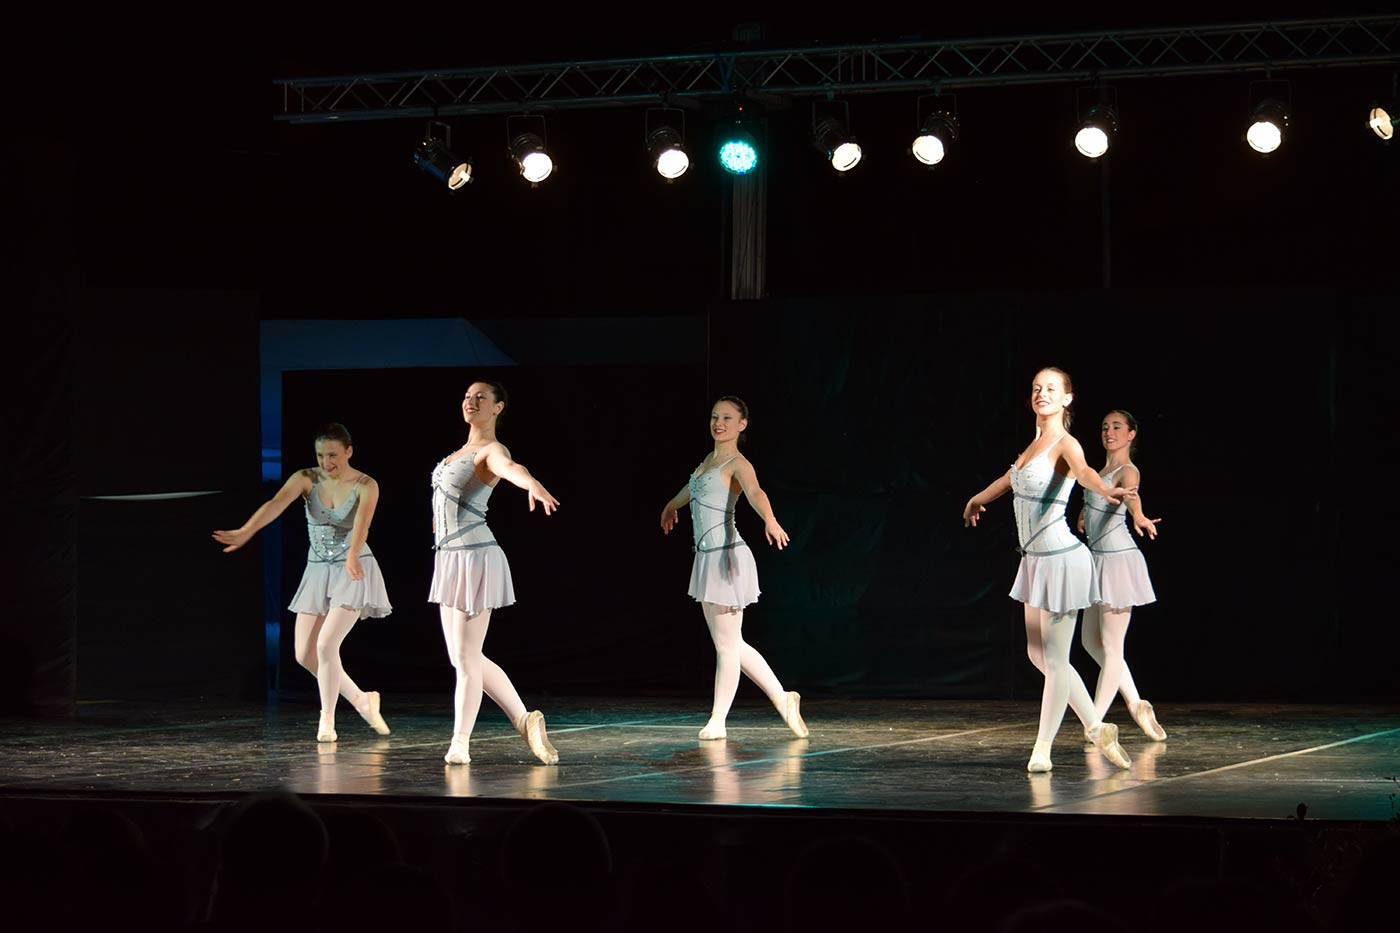 saggio-danza-gymnasium-2016-barberino-2